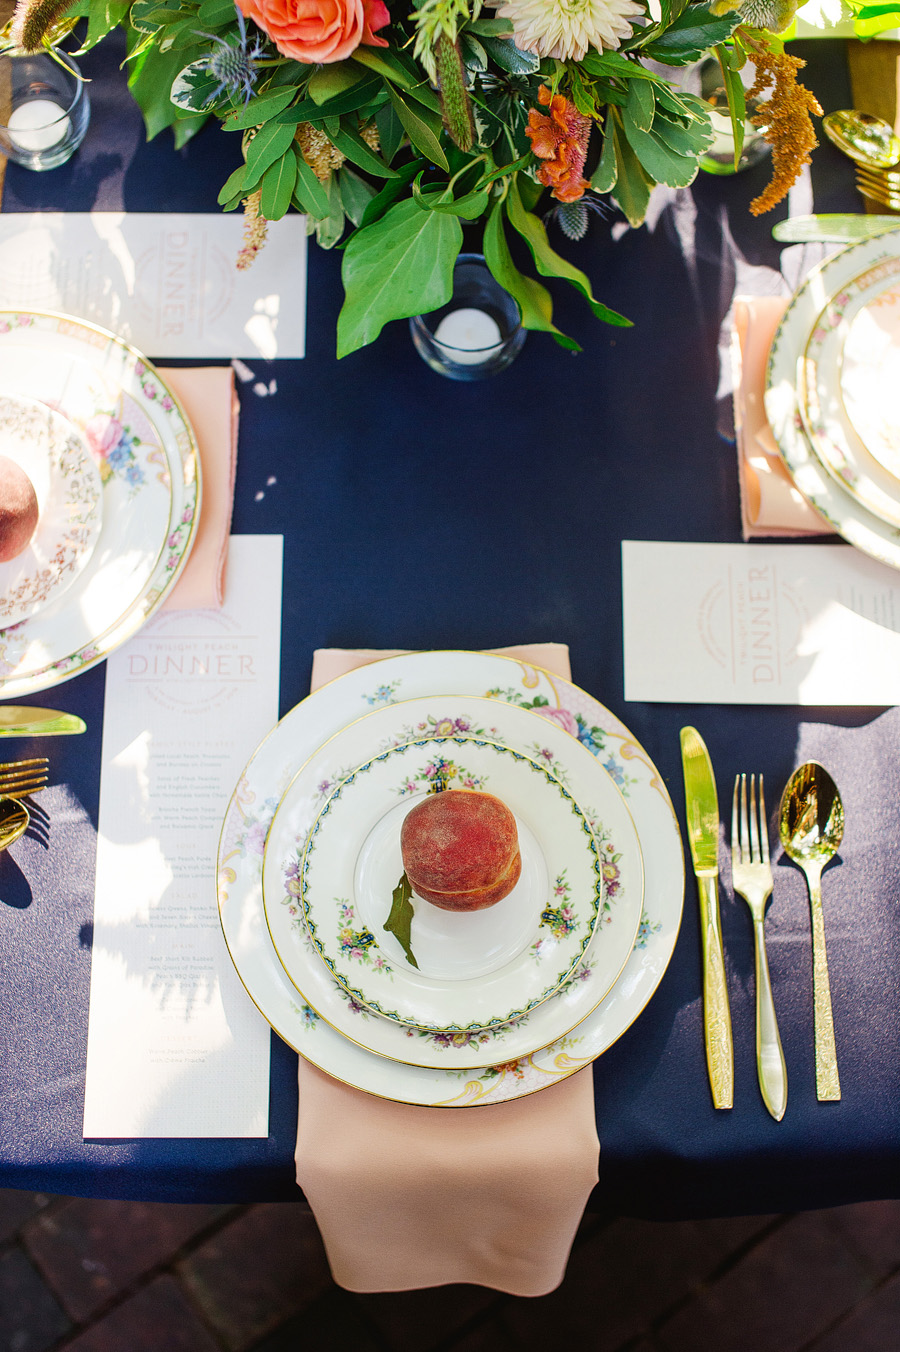 West-Chester-PA-Faunbrook-Harvest-Dinner-Series-Peach-AlexandraWhitney-17.jpg